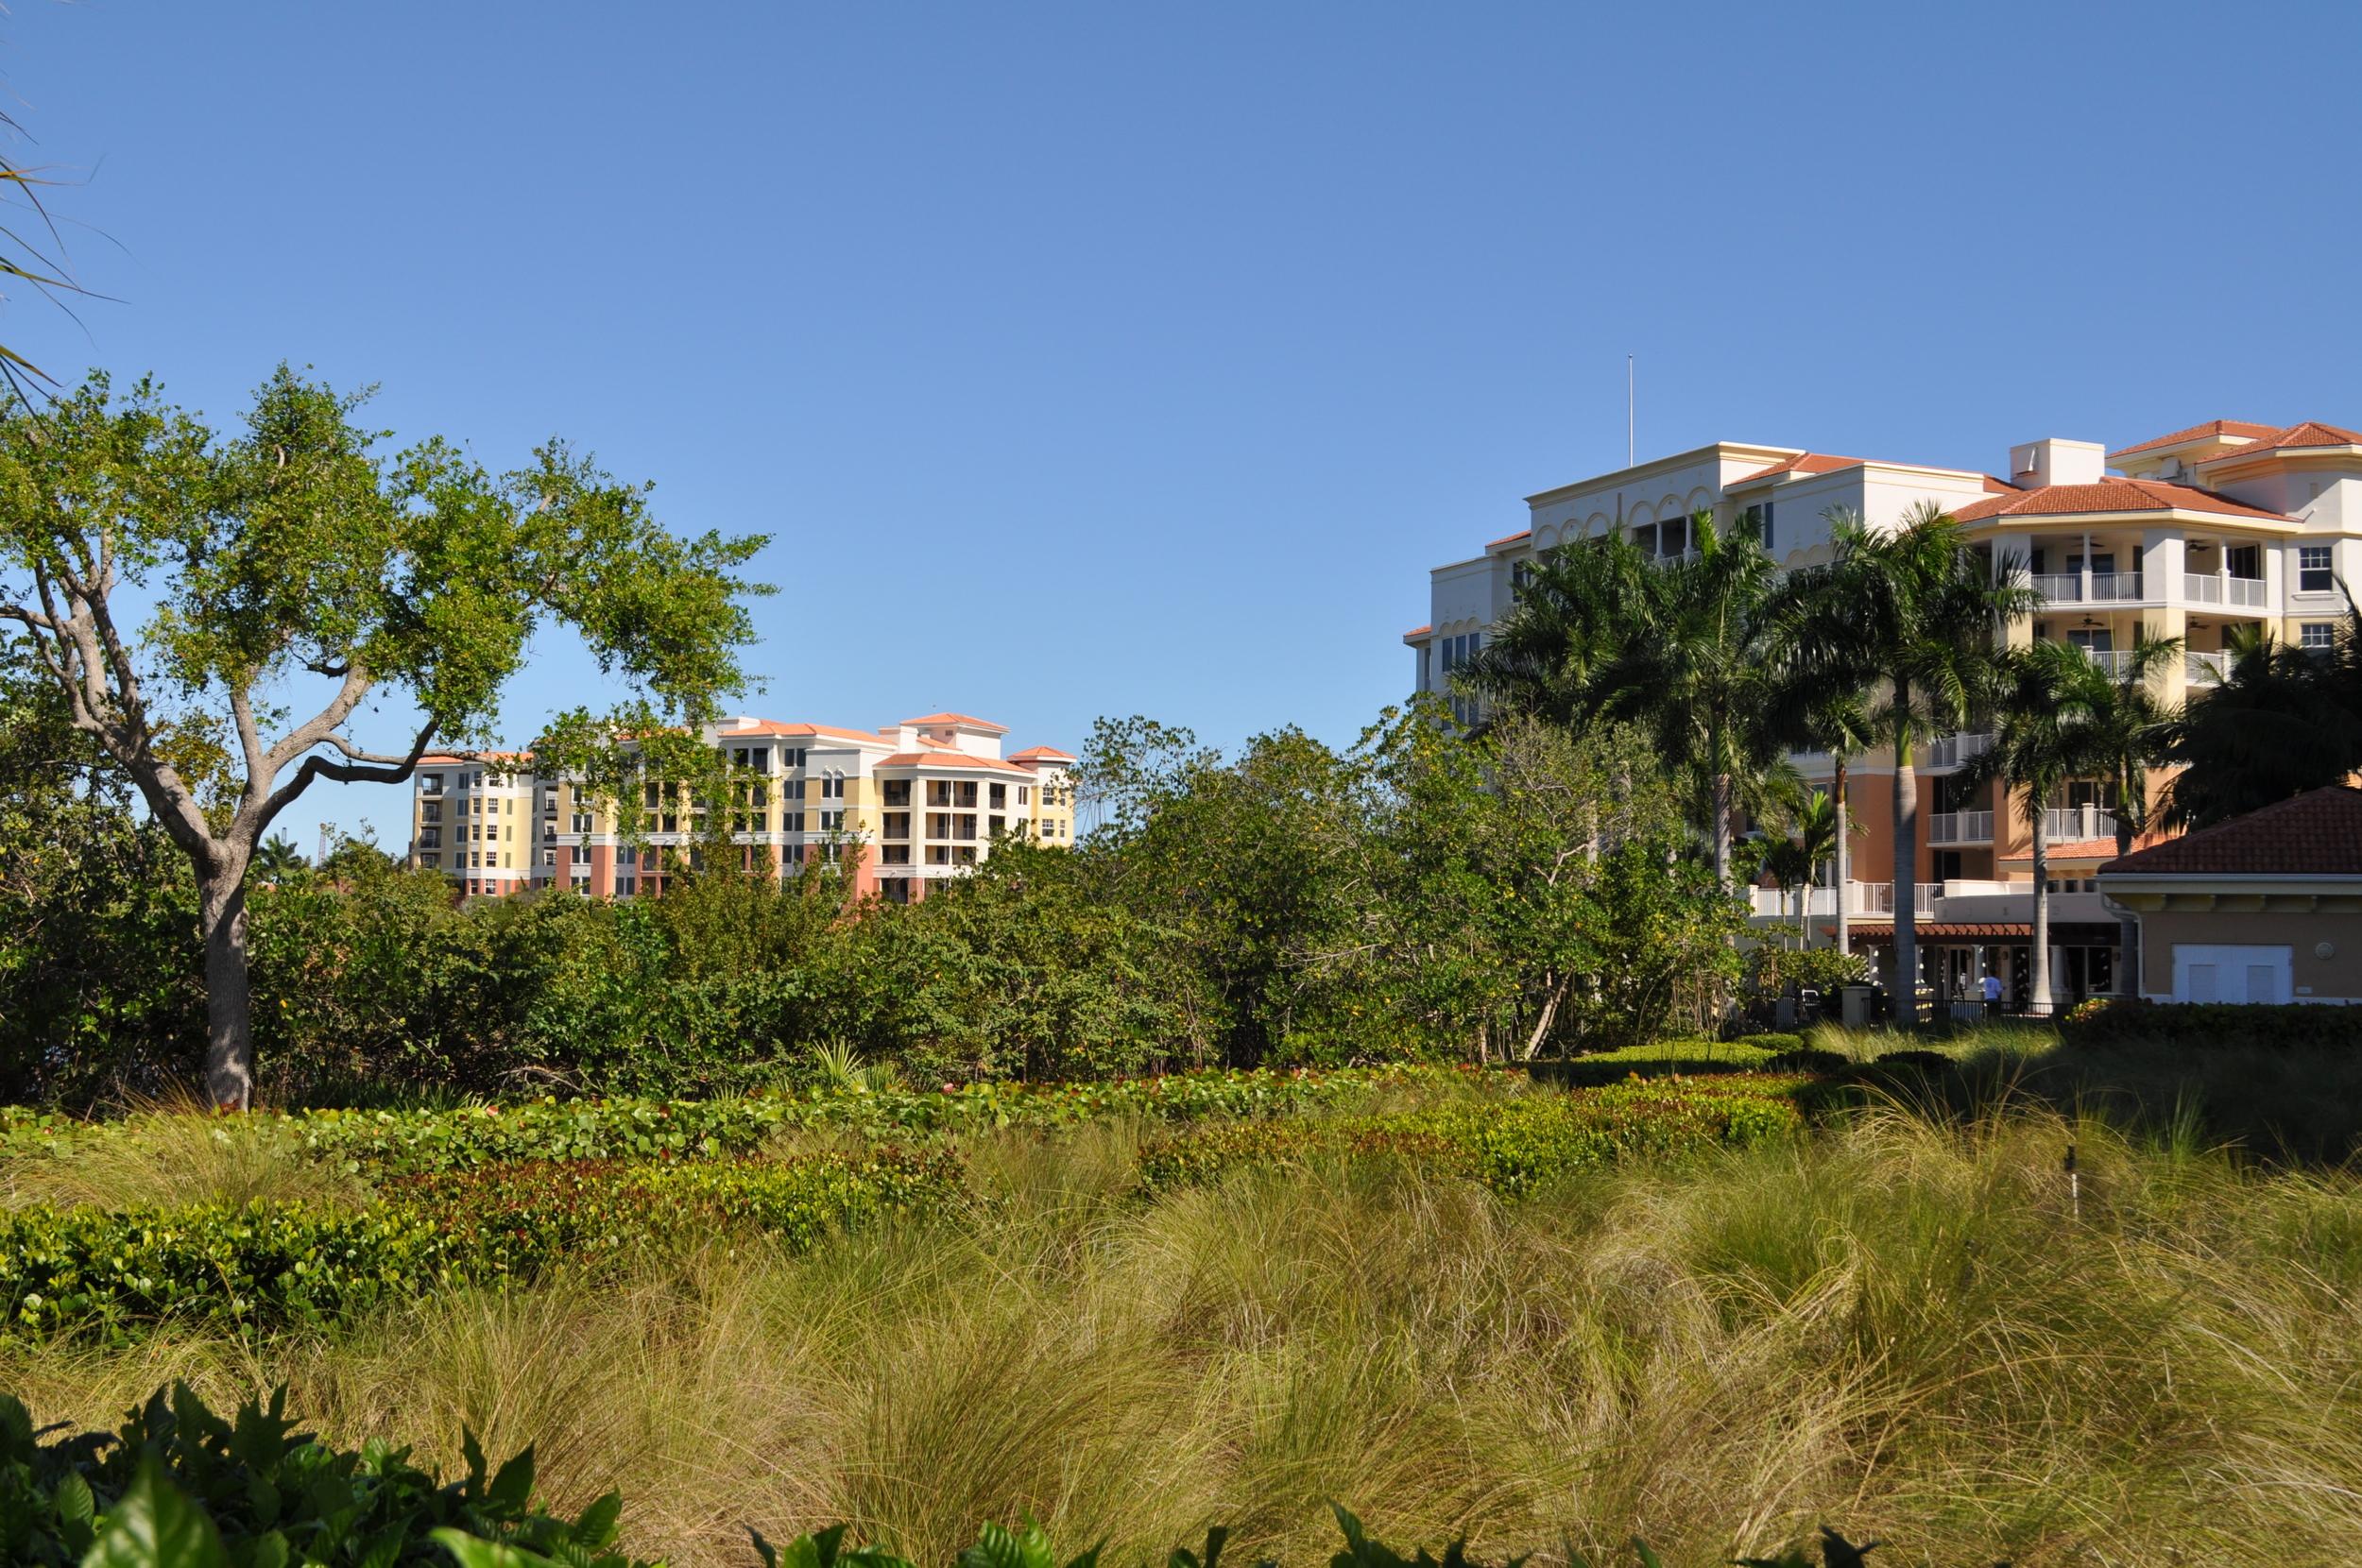 Jupiter Yacht Club Florida Bio Swale Retention.JPG